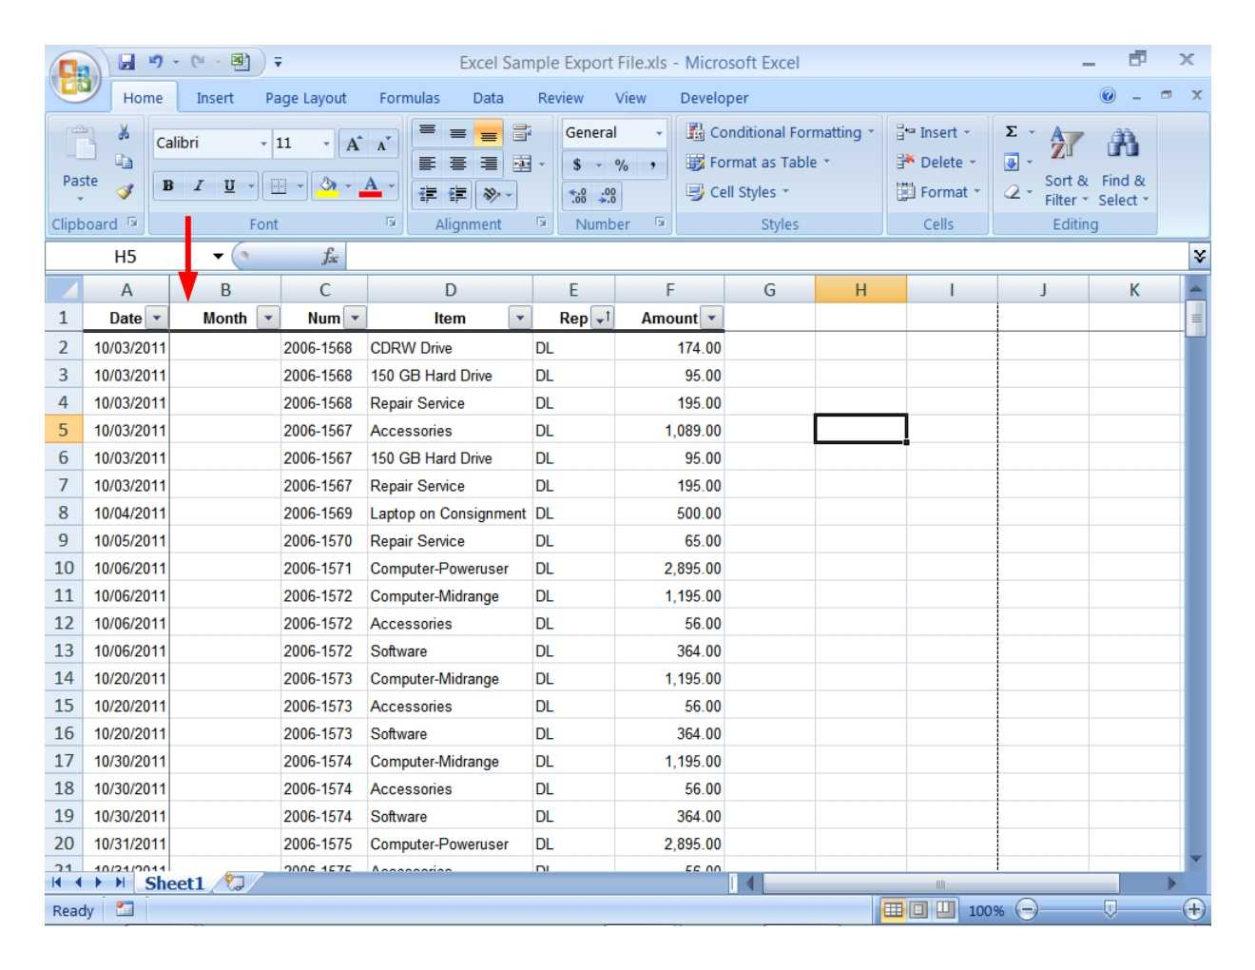 Meal Plan Spreadsheet Regarding Sample Spreadsheet On Free Unlock Excel Fast Metabolism Diet Meal